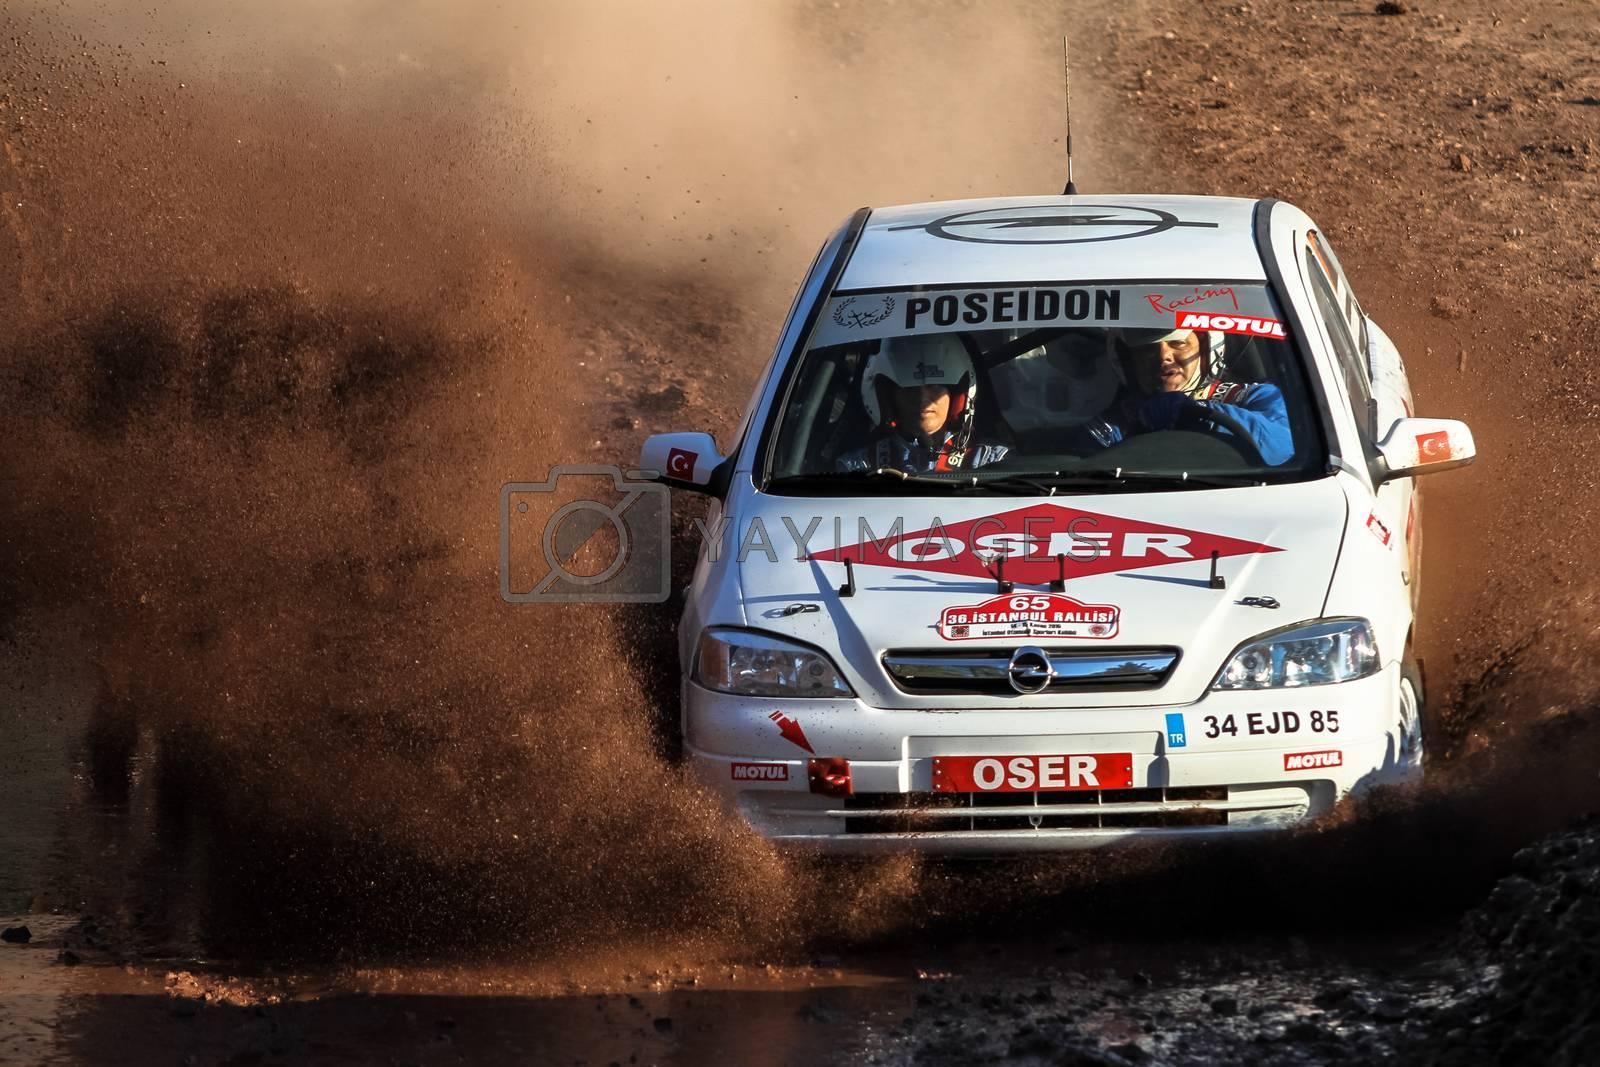 ISTANBUL, TURKEY - NOVEMBER 14, 2015: Osman Karaosman drives Opel Astra in Isok Istanbul Rally 2015, Gocbeyli stage